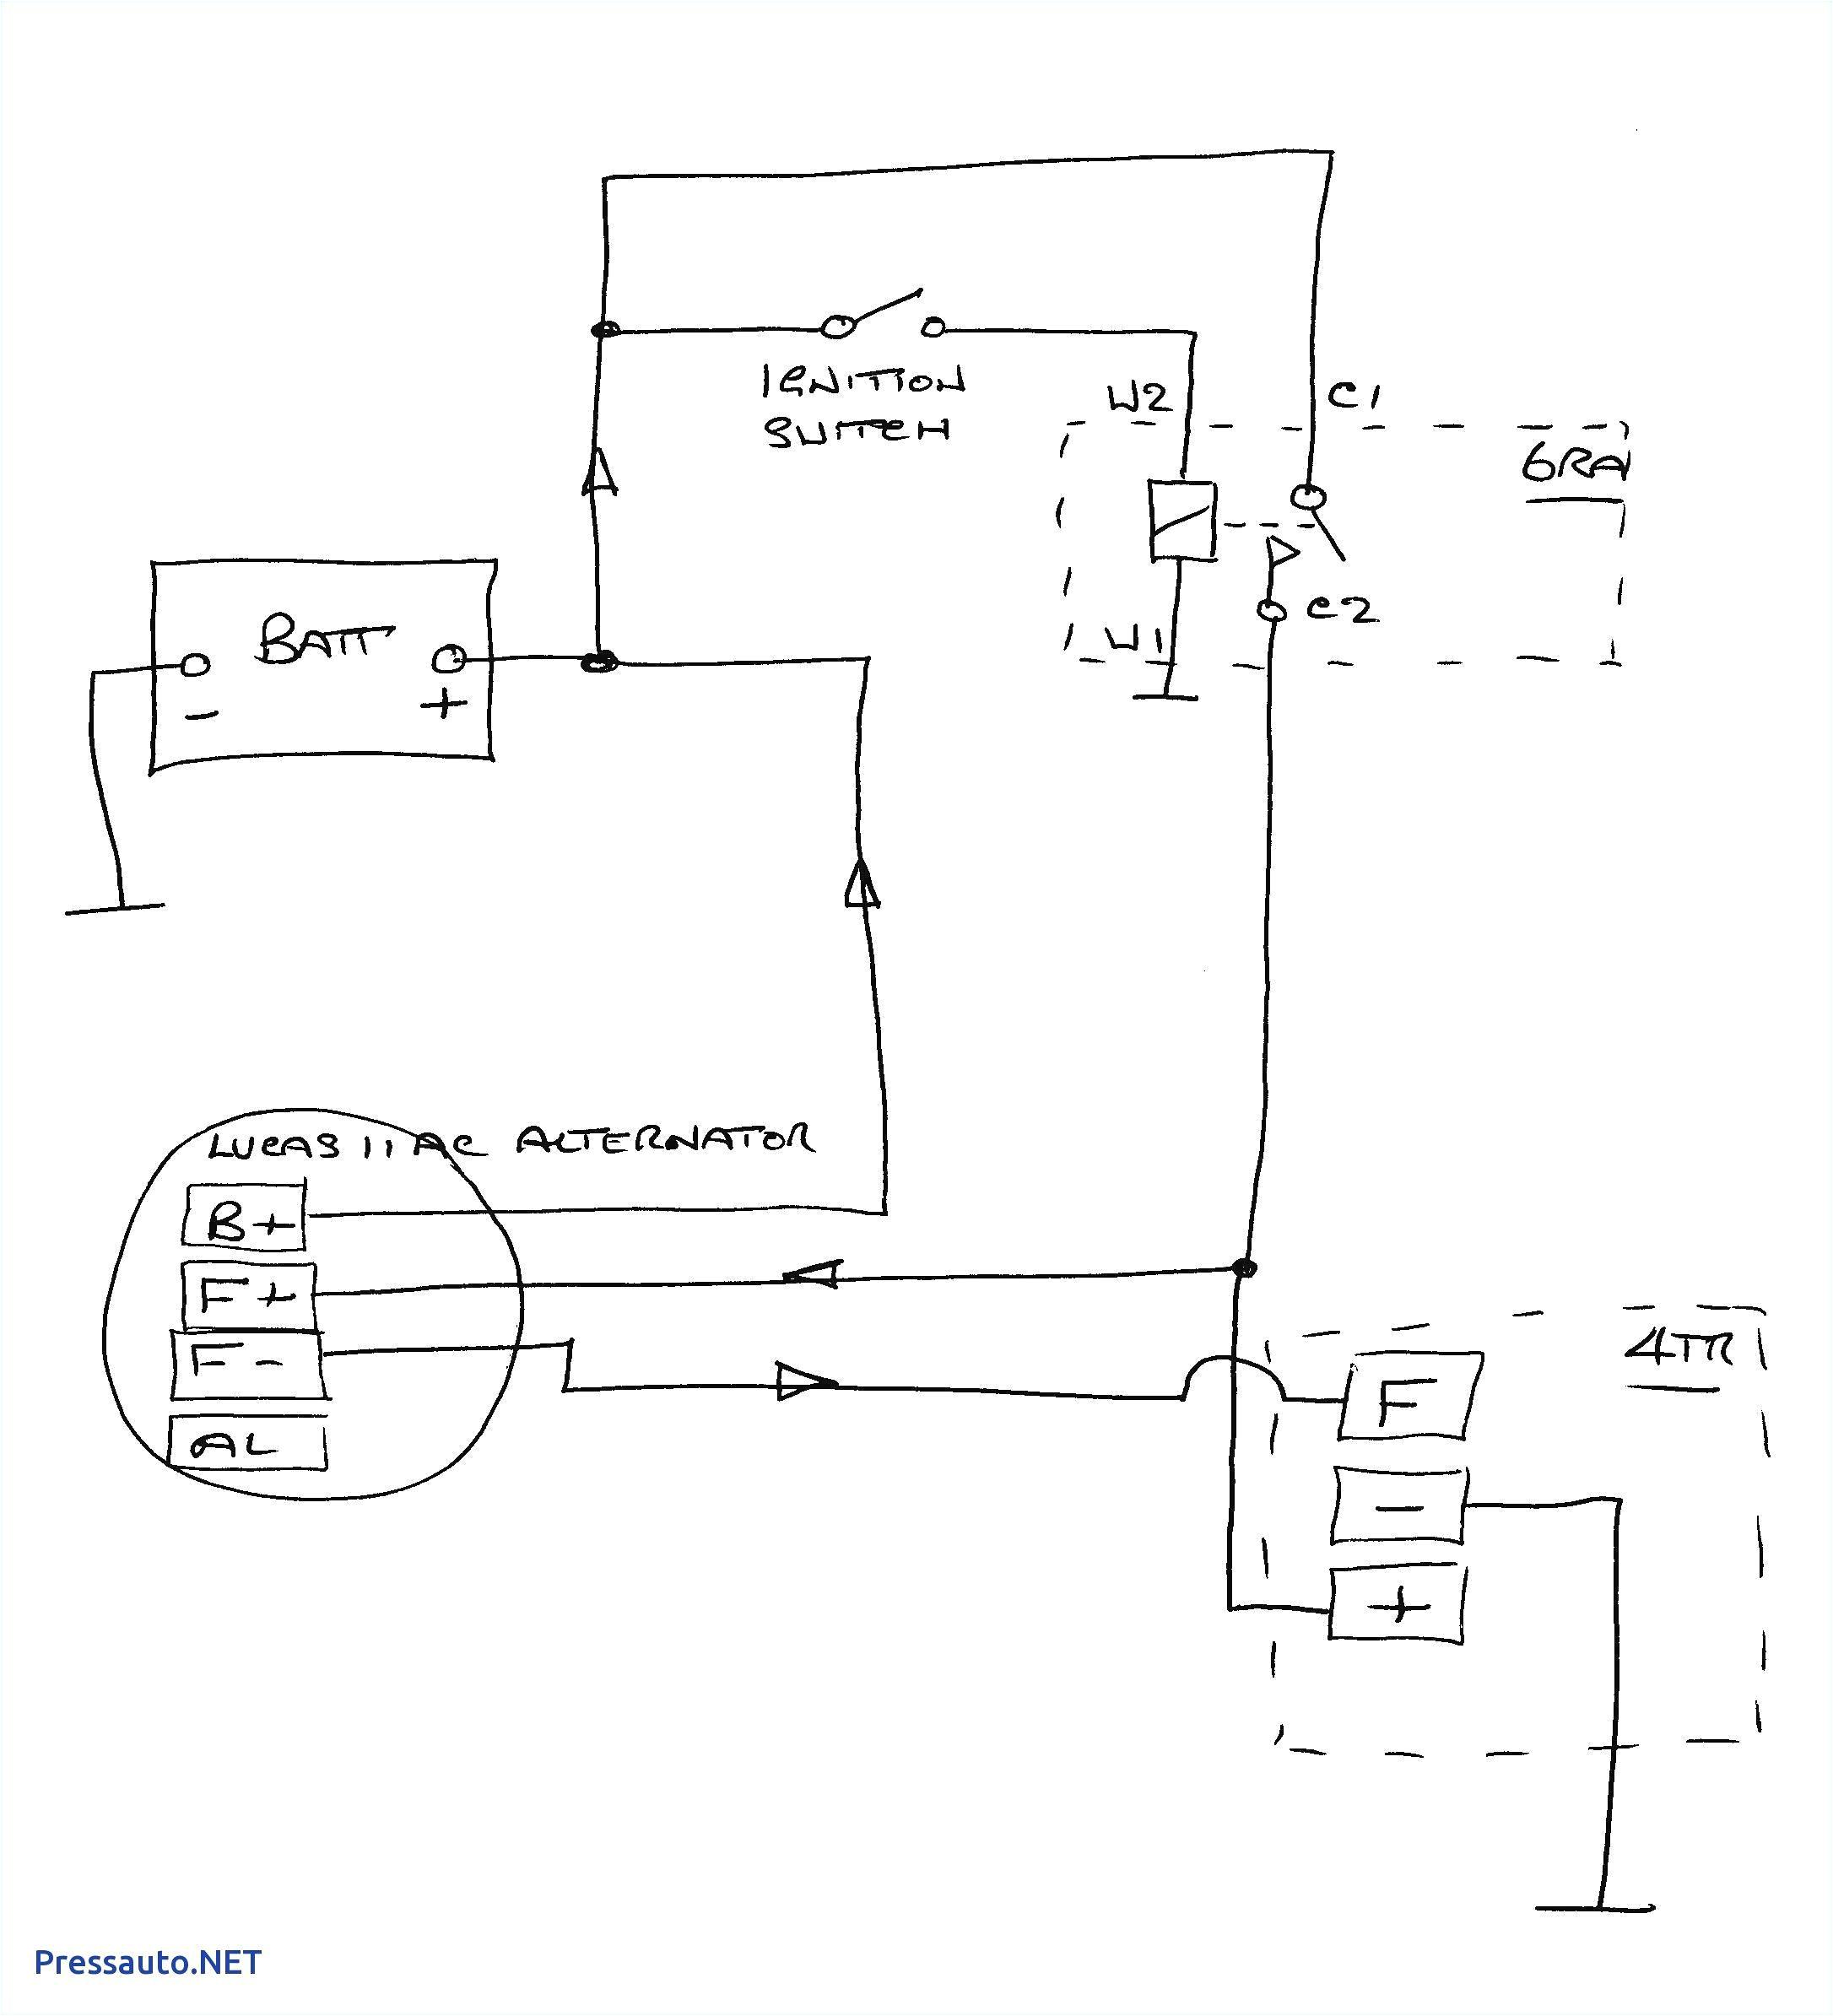 4 wire denso alternator diagram wiring diagram sheet 4 wire denso alternator connection diagram wiring diagram